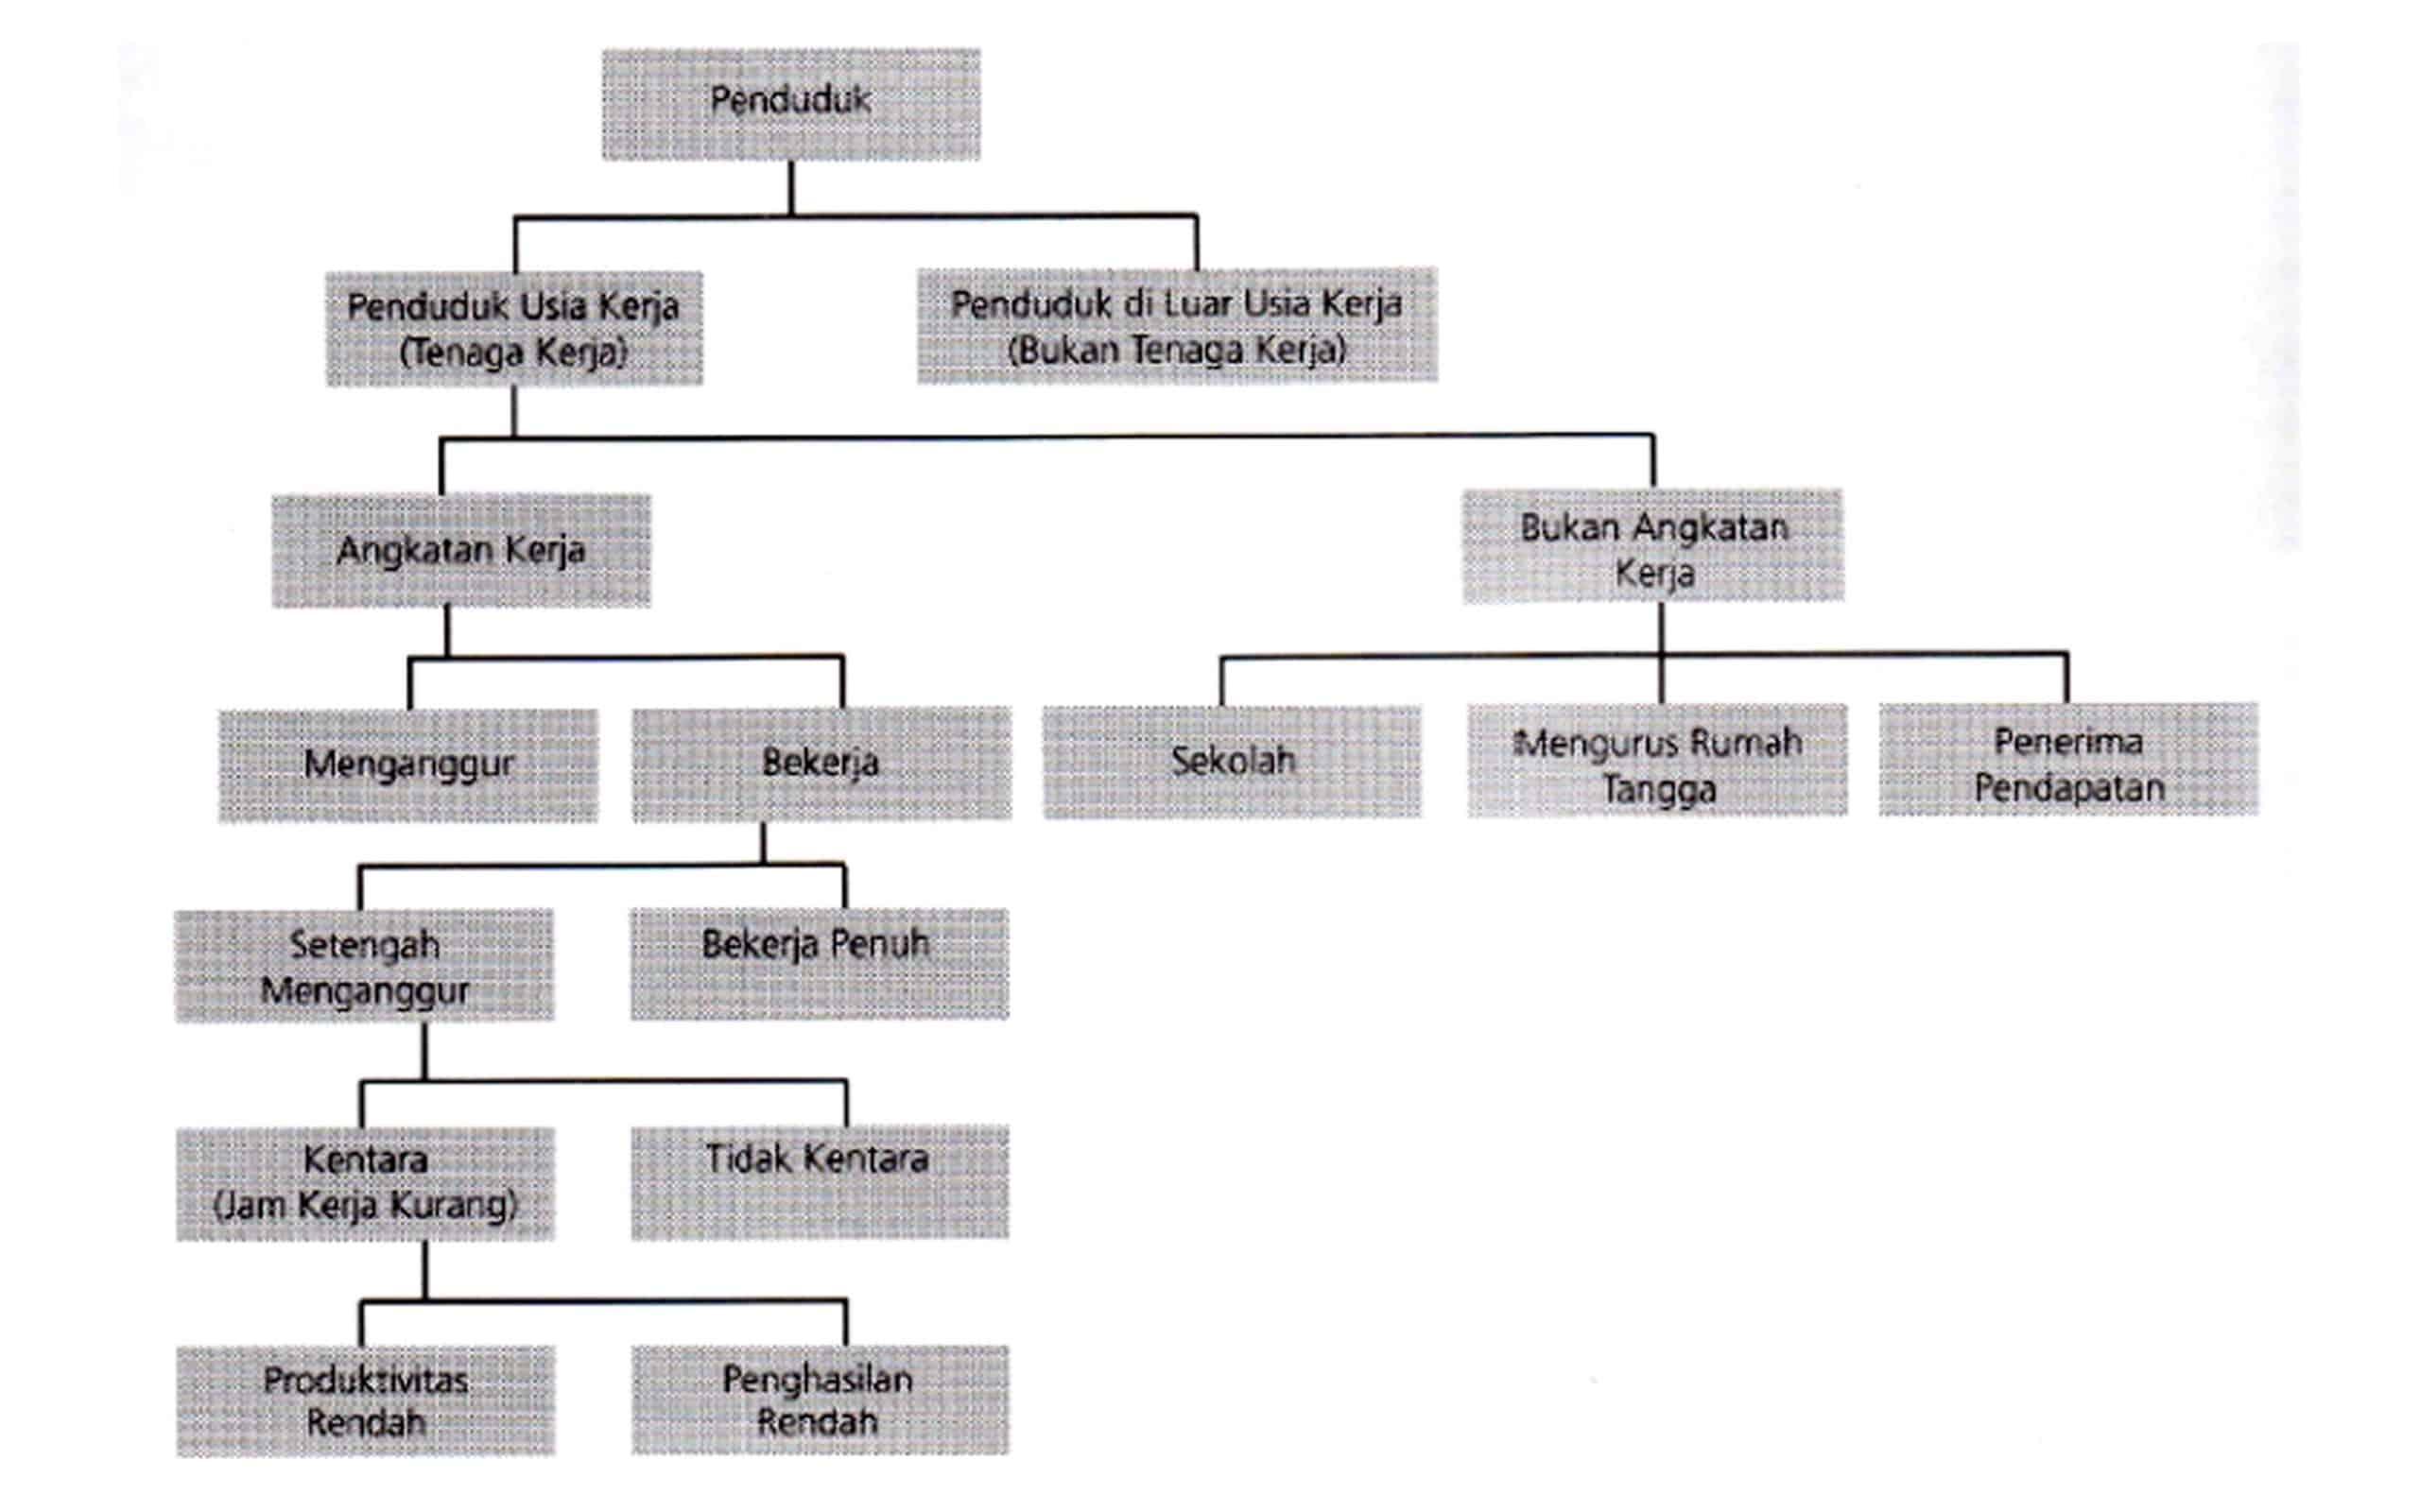 Komposisi Penduduk dan Tenaga Kerja